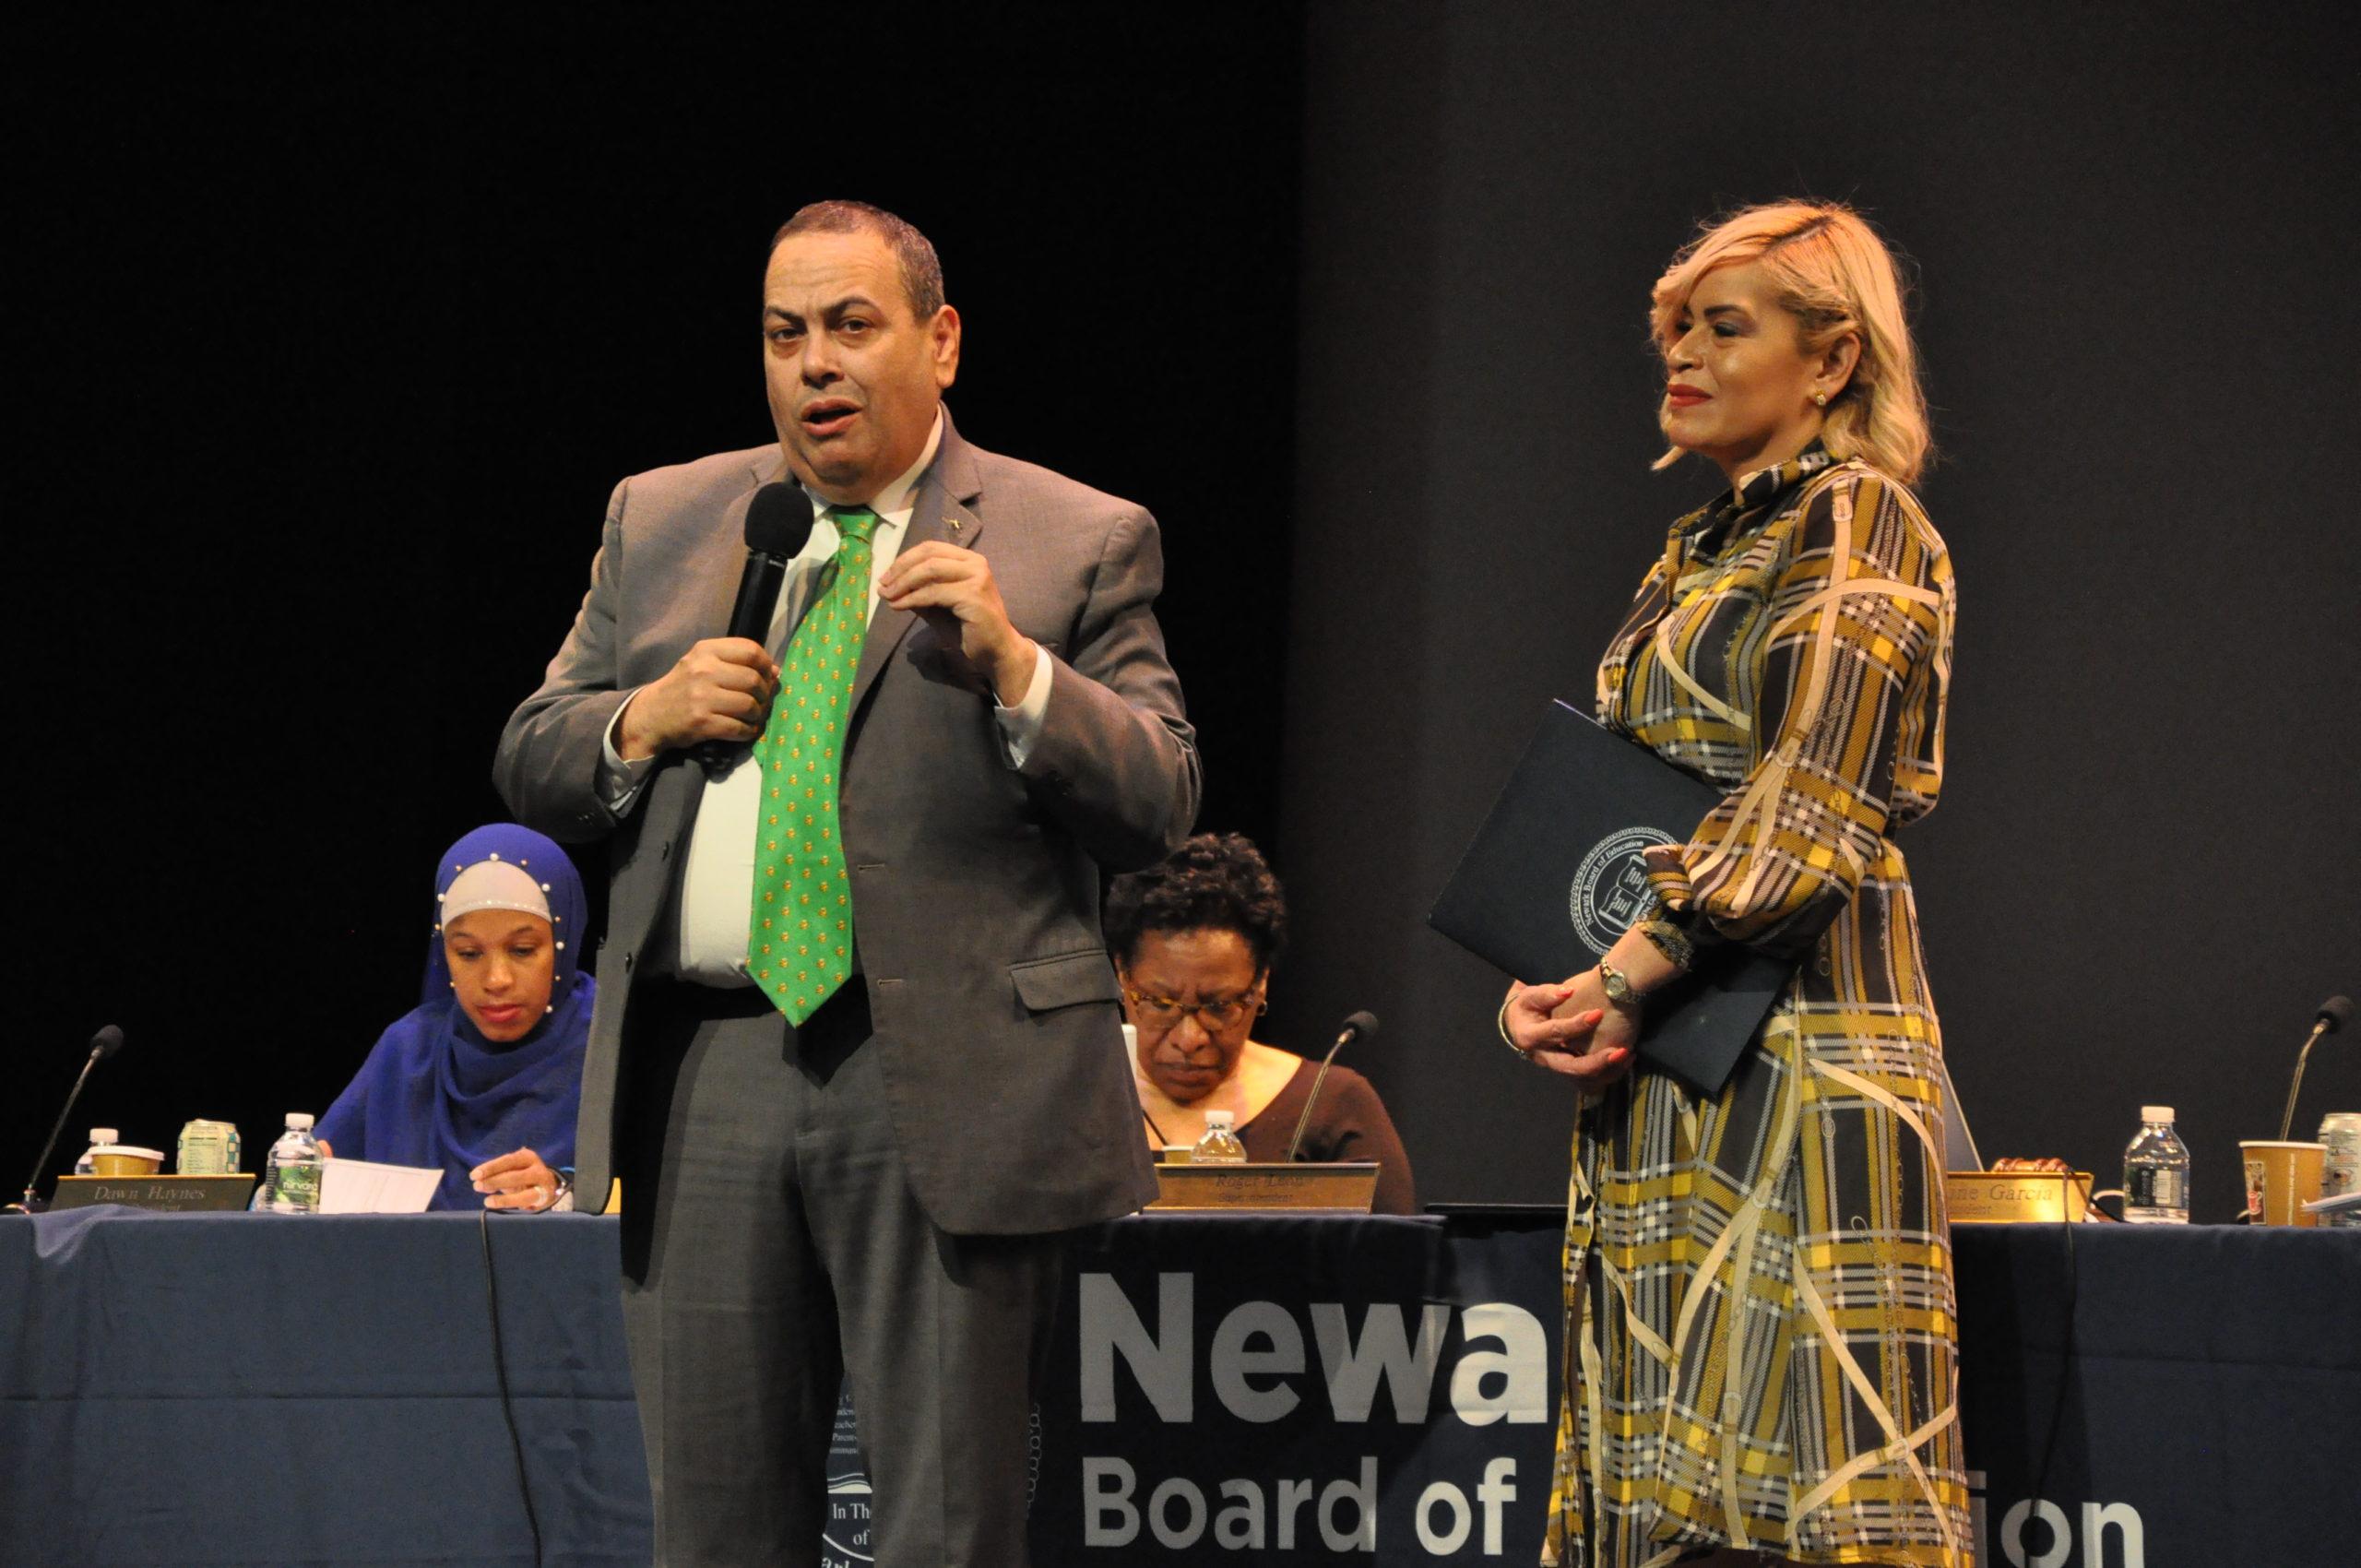 Newark superintendent Roger León, alongside board president Josephine Garcia, addresses the crowd at the November 26, 2019, school board meeting.